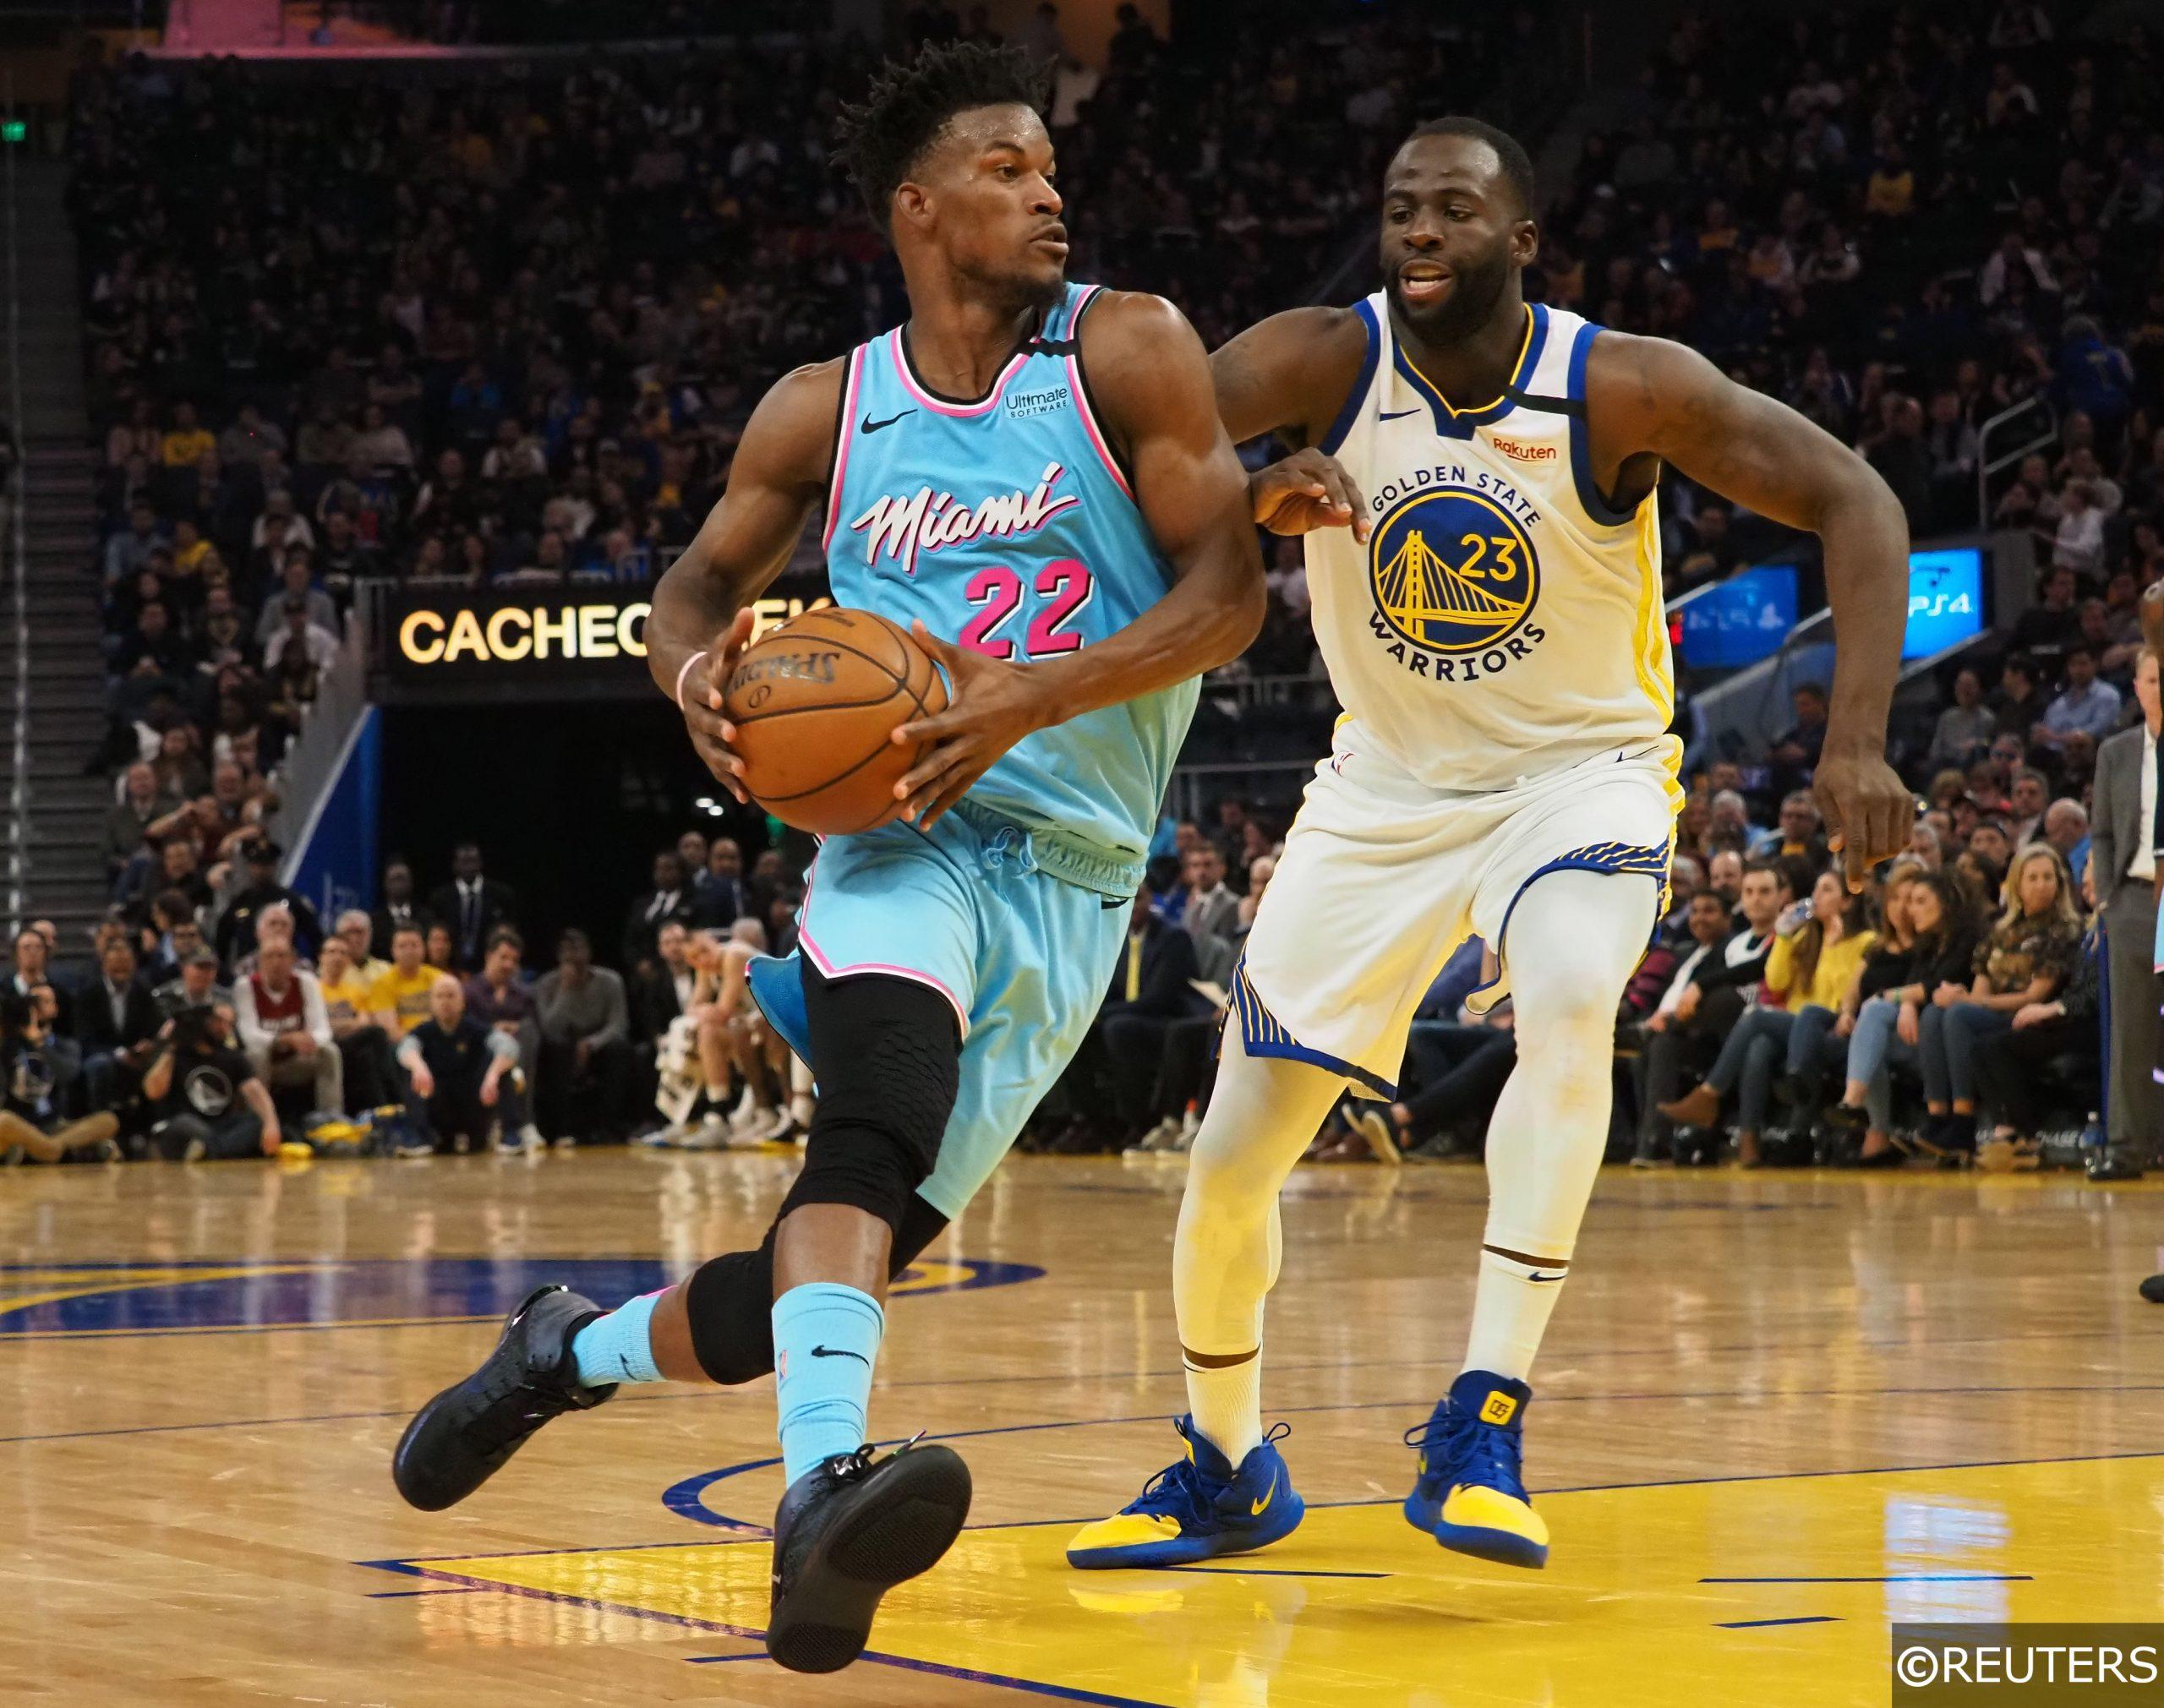 NBA 2020 Miami Heat vs Golden State